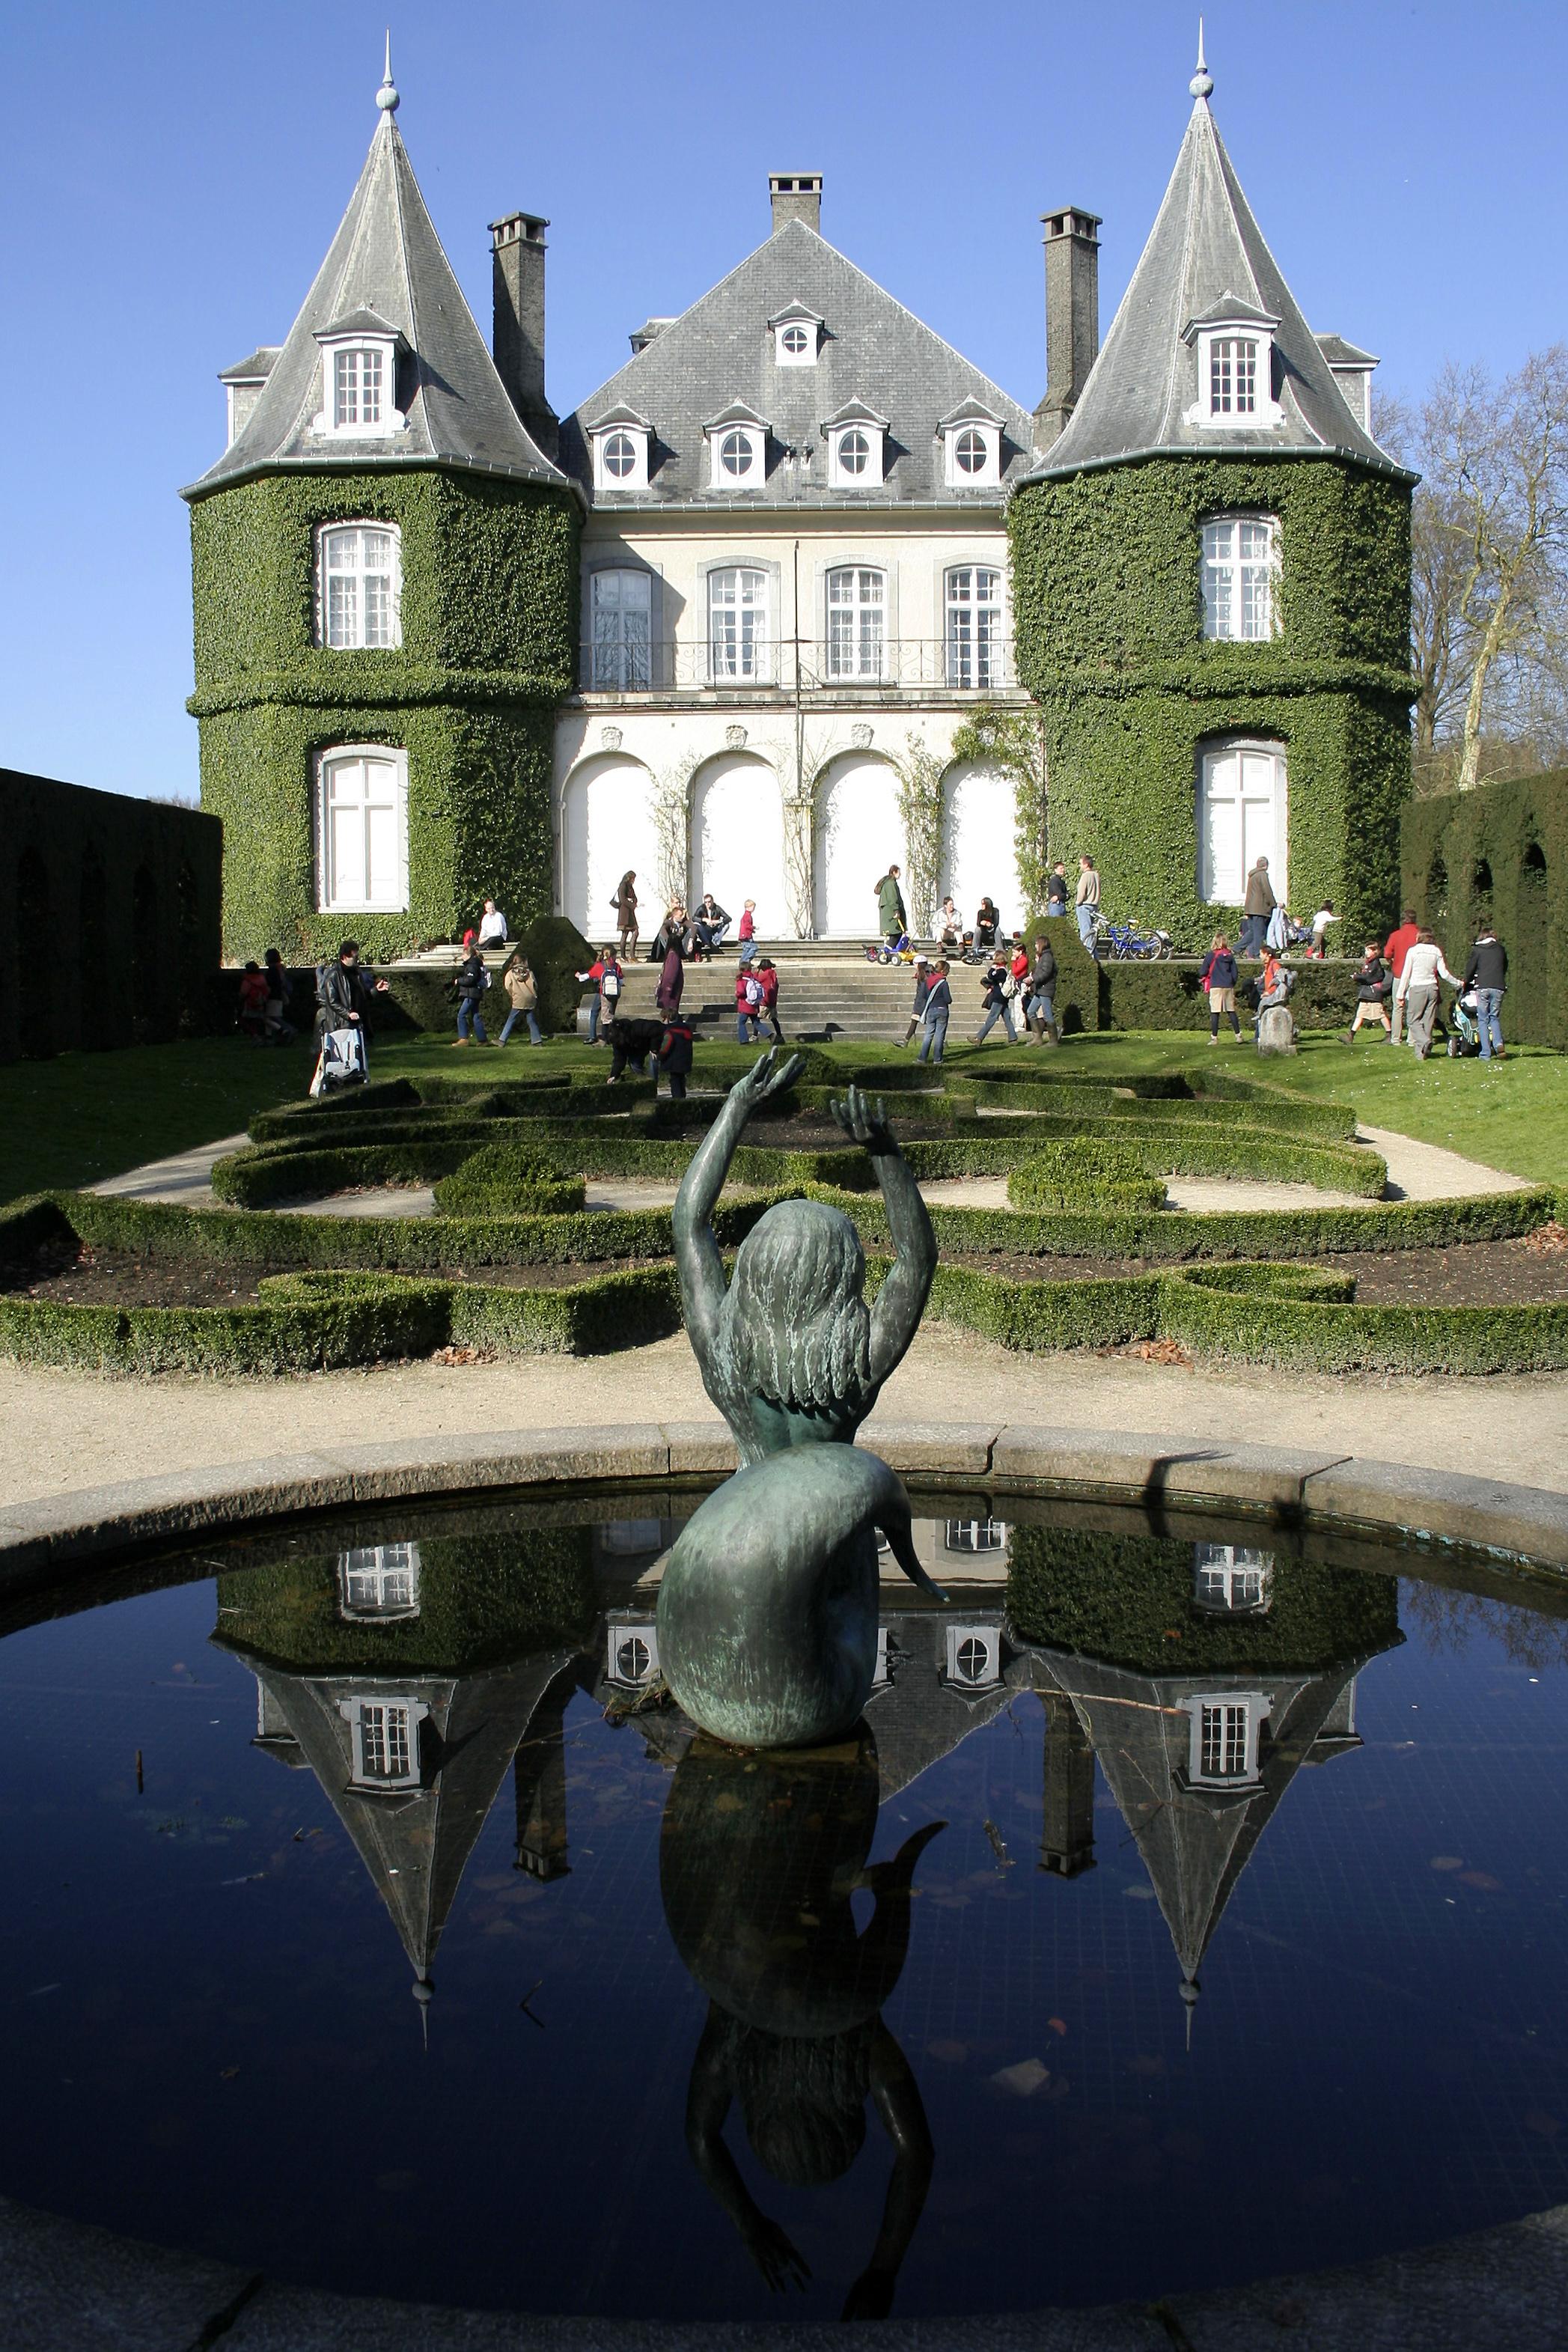 La Hulpe Belgium  city images : La Hulpe 070311 36 Wikimedia Commons